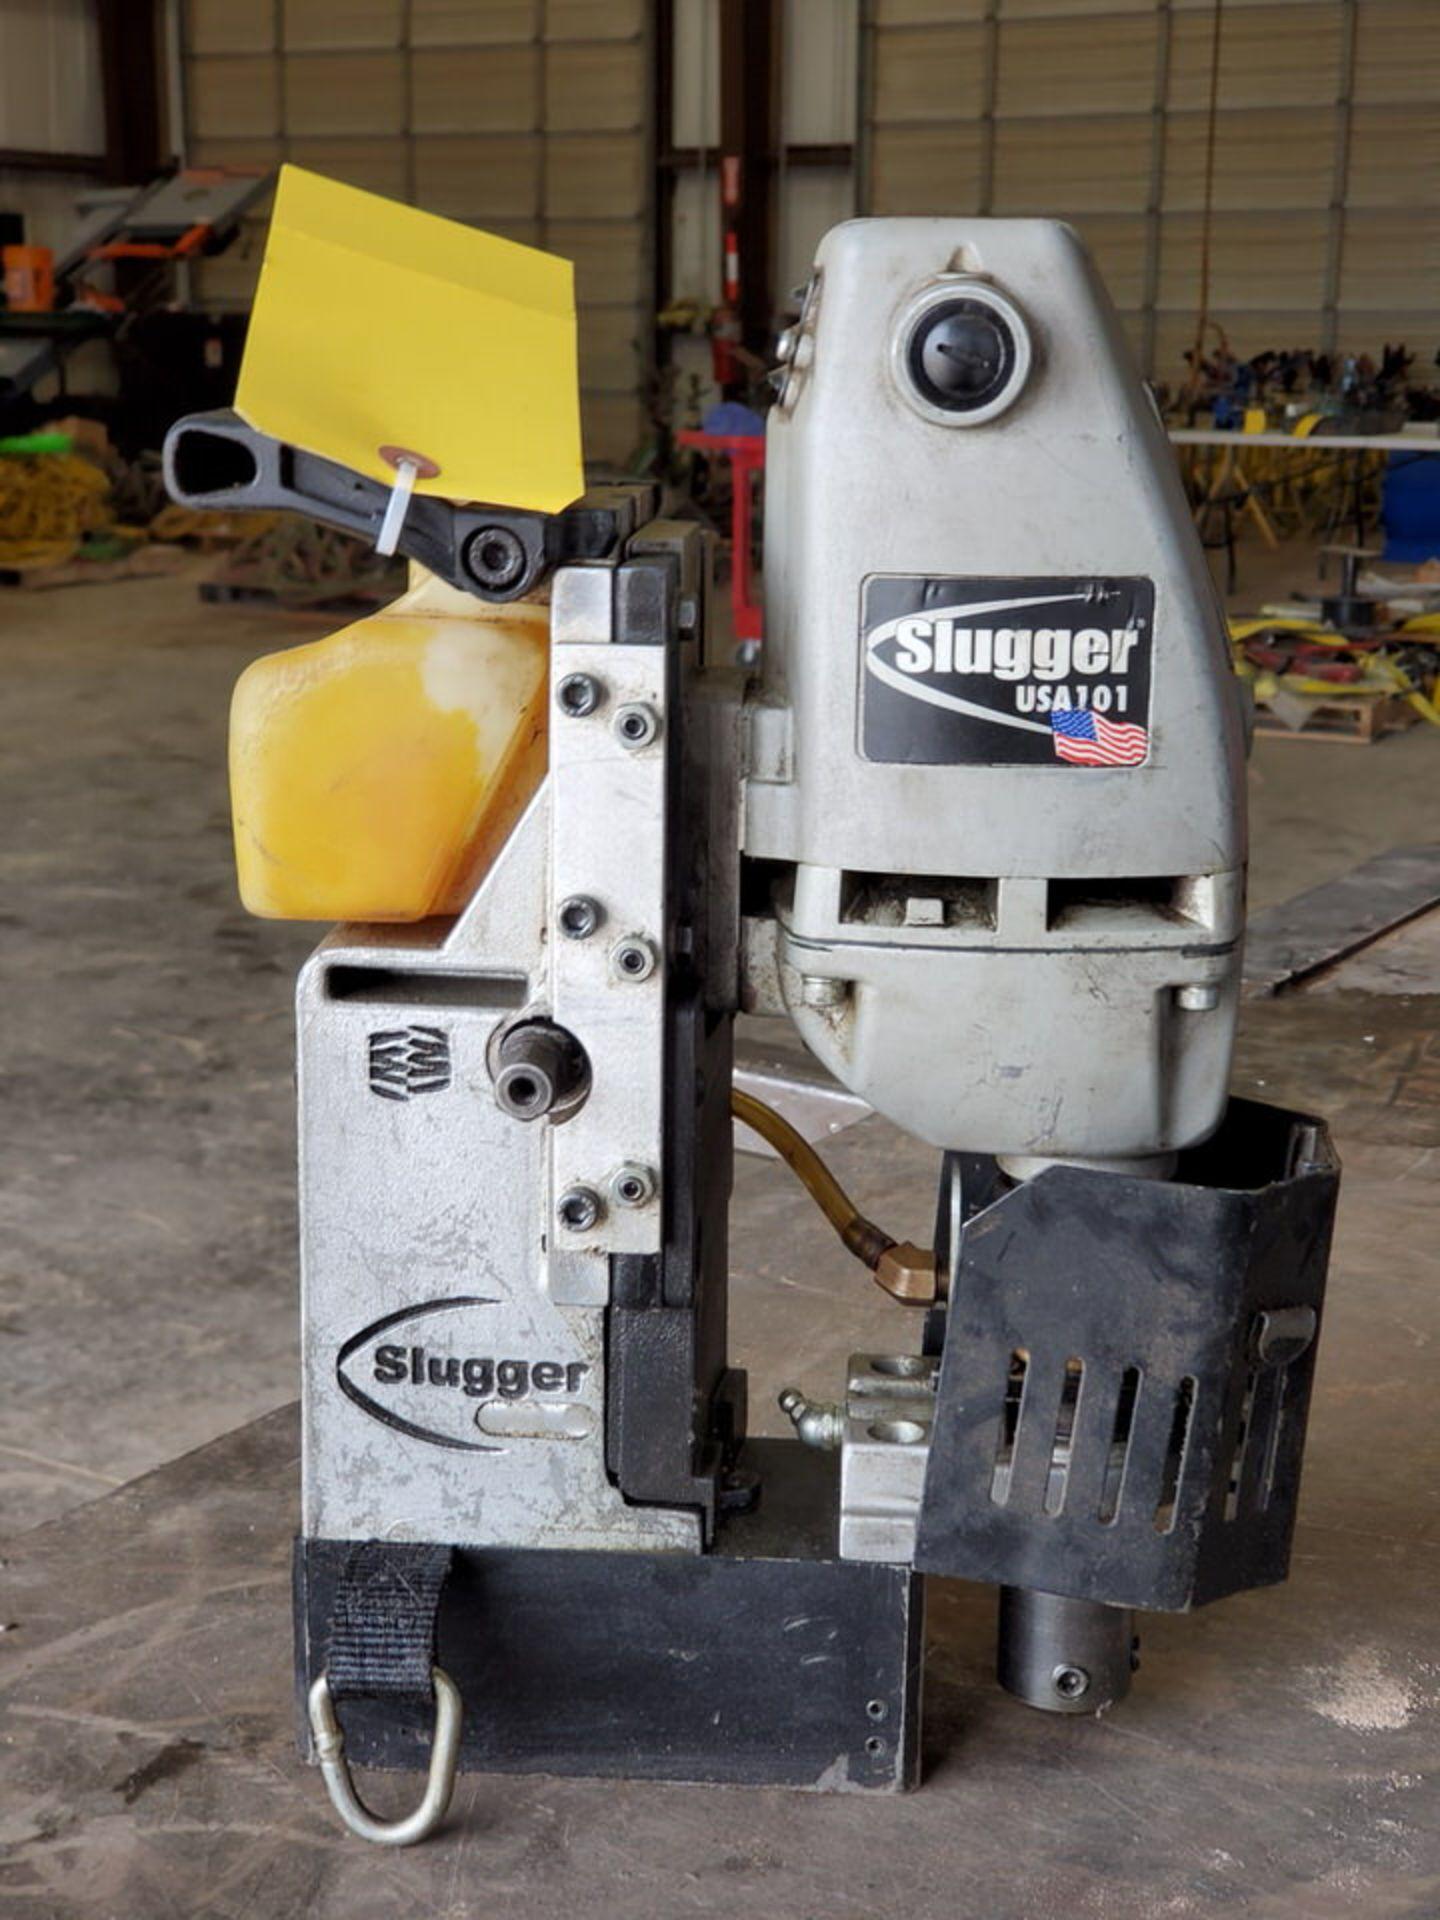 Jancy Slugger USA101 Mag Drill 115V, 11.5A, 50/60HZ, 1400W - Image 4 of 5